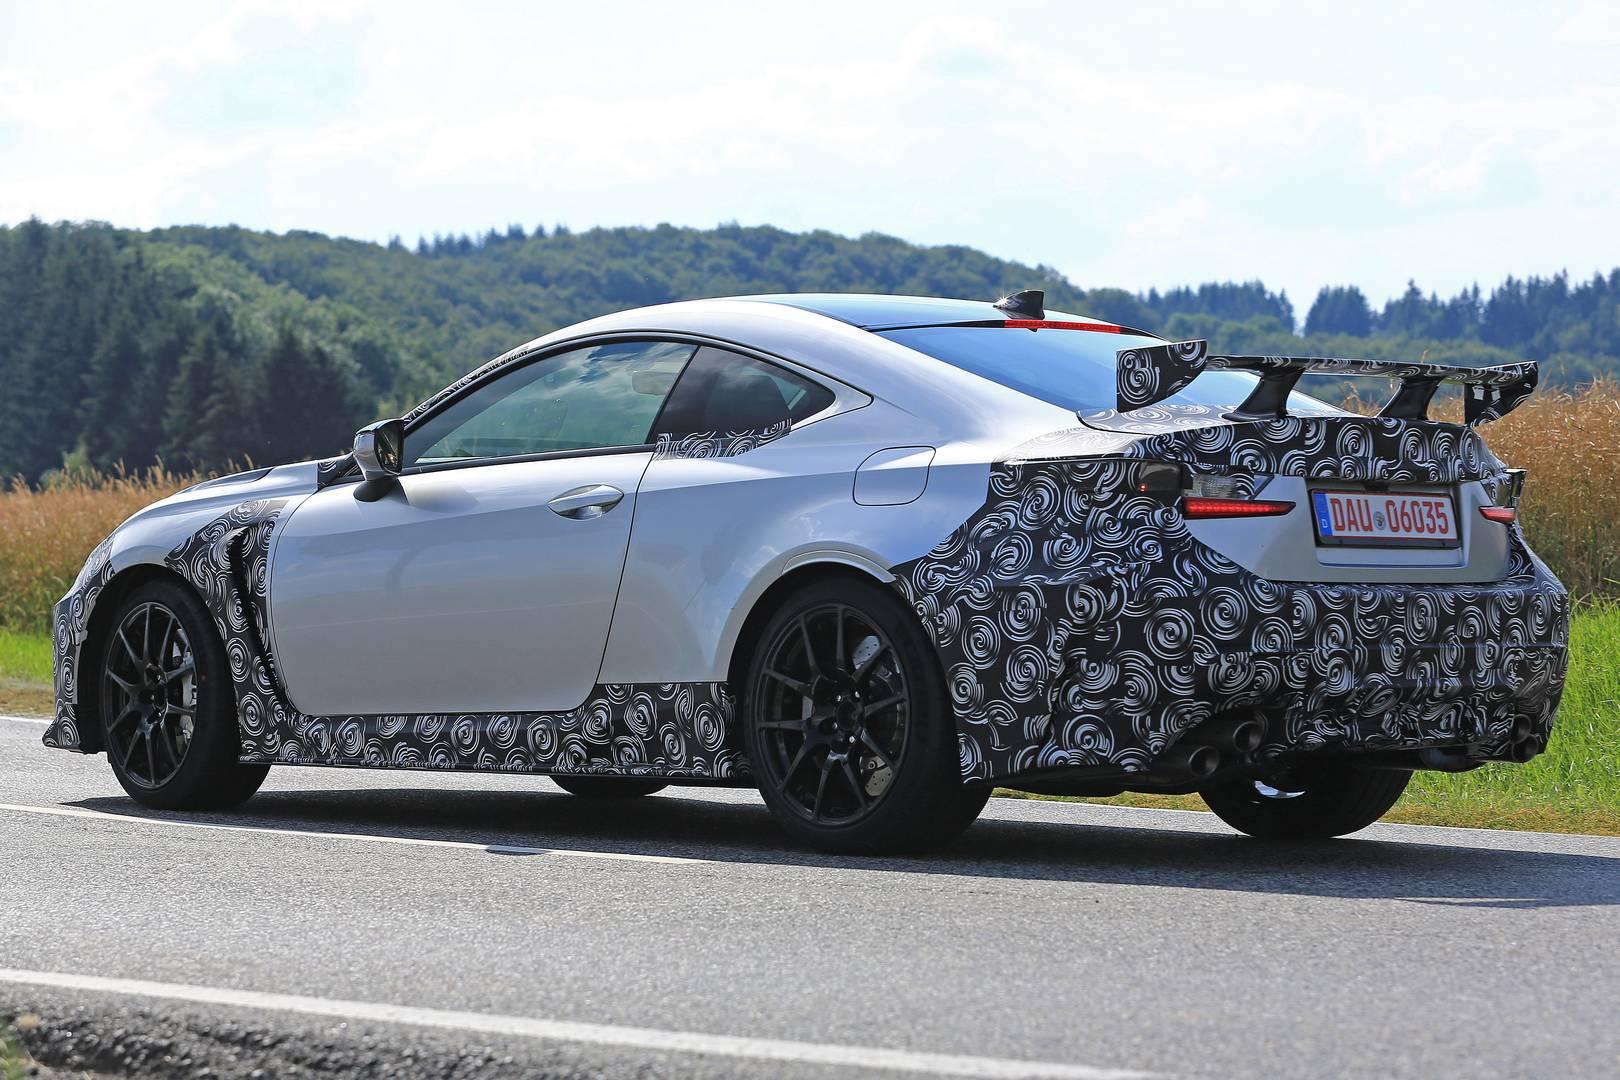 2019 Lexus RC F GT Spy Shots Emerge